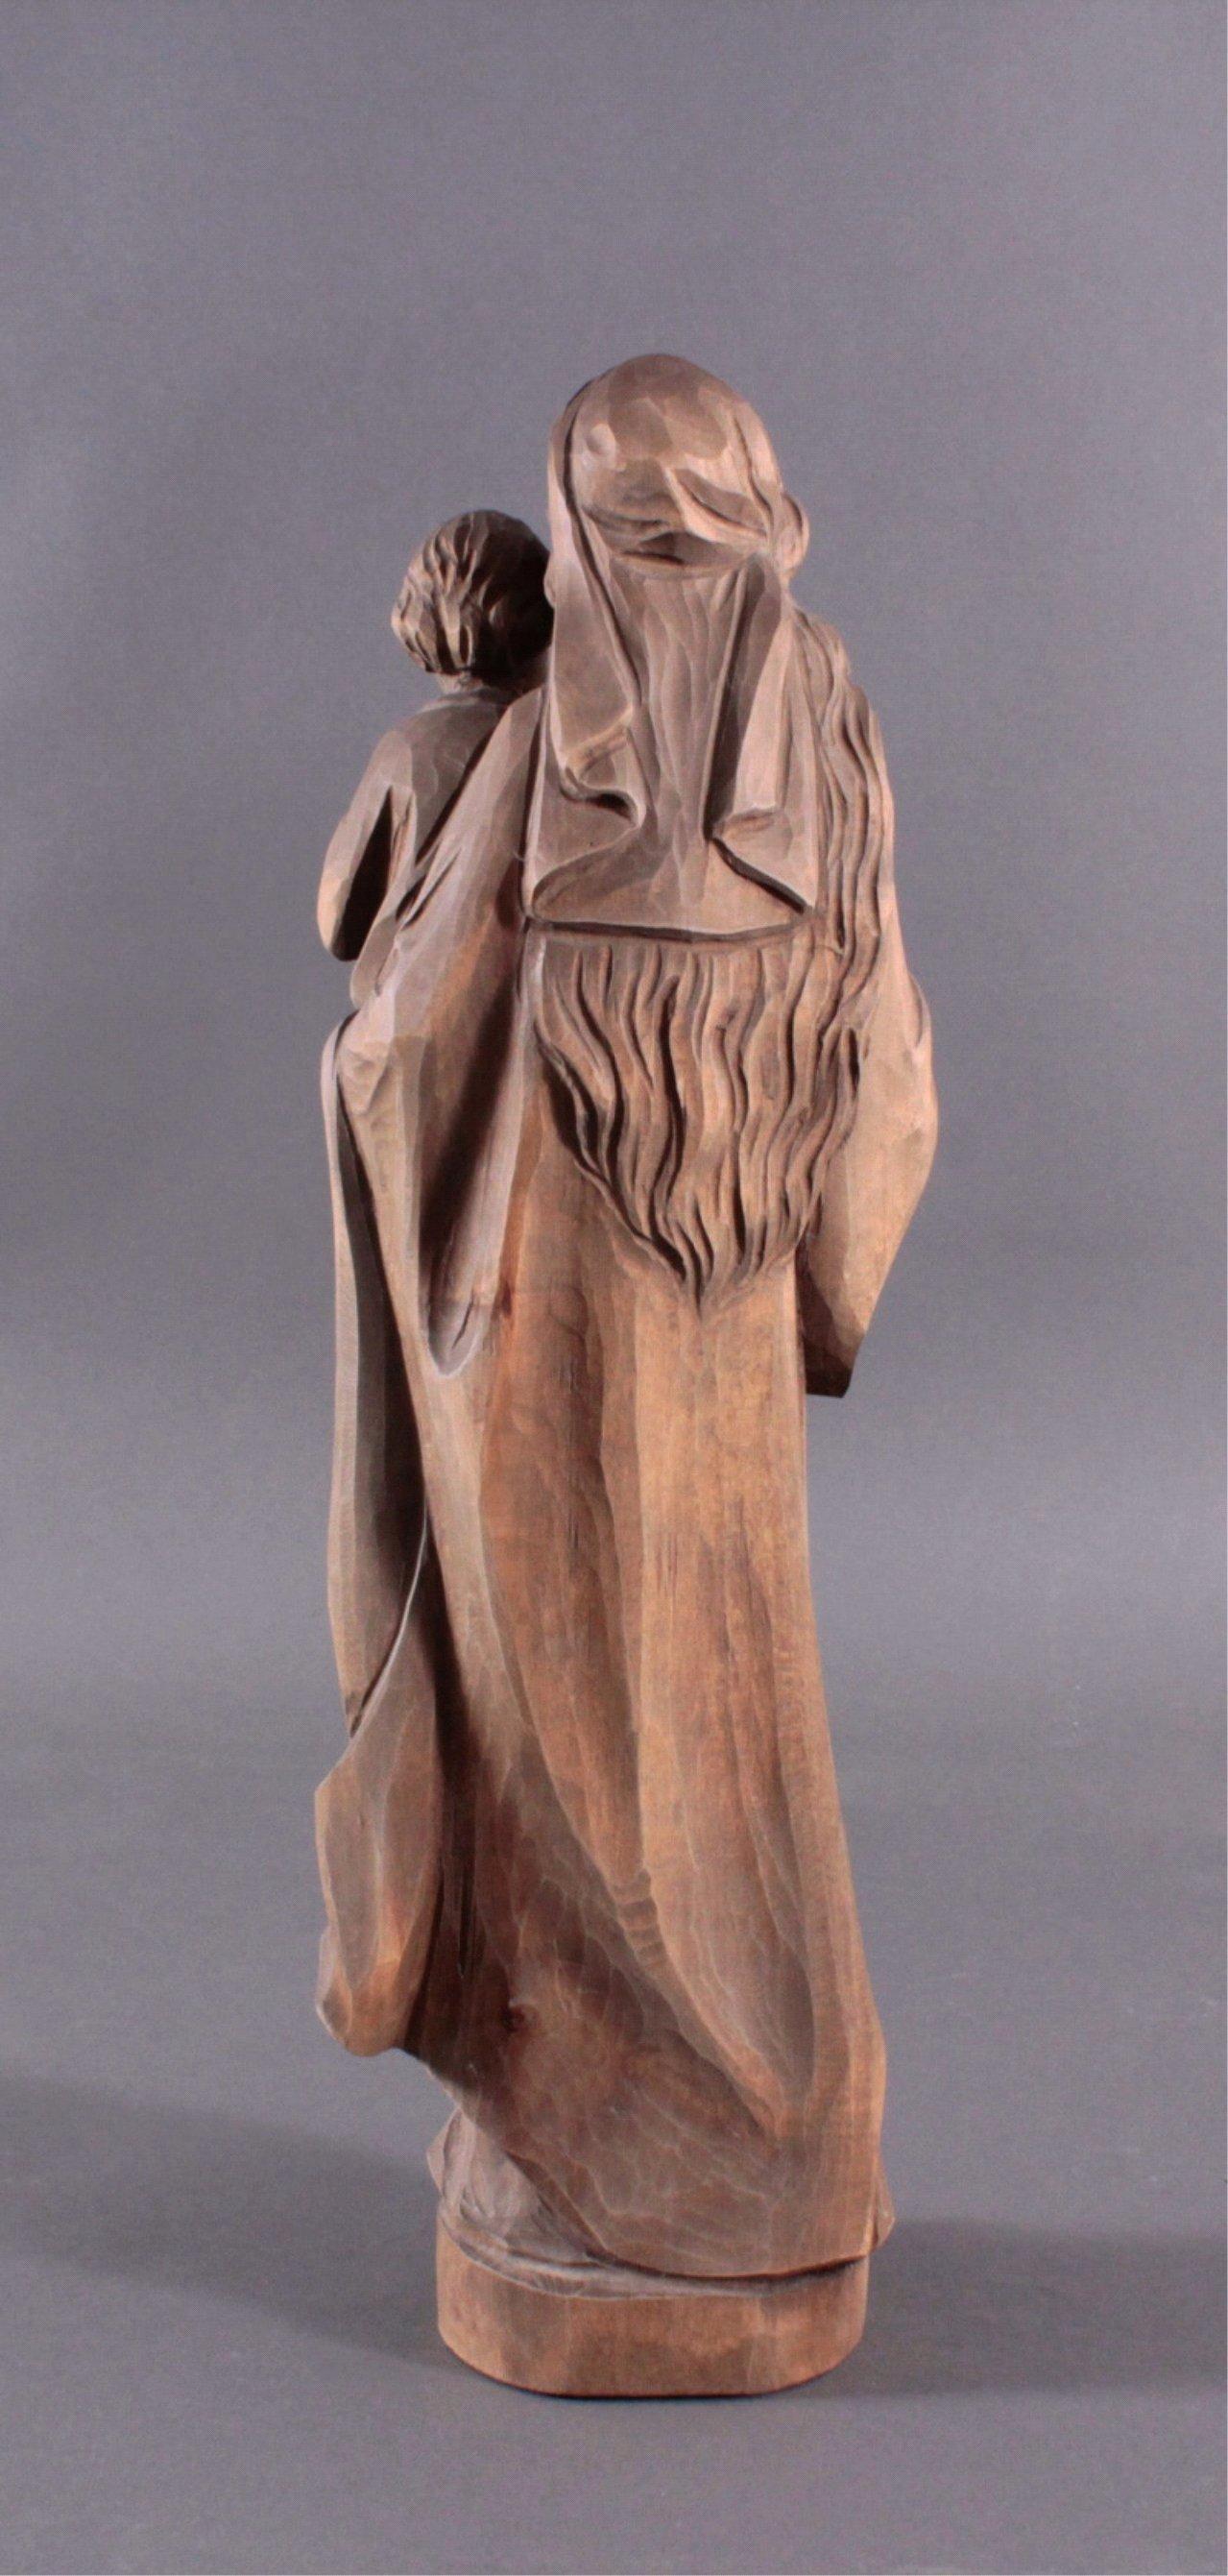 Holz Skulptur Madonna mit Kind-2